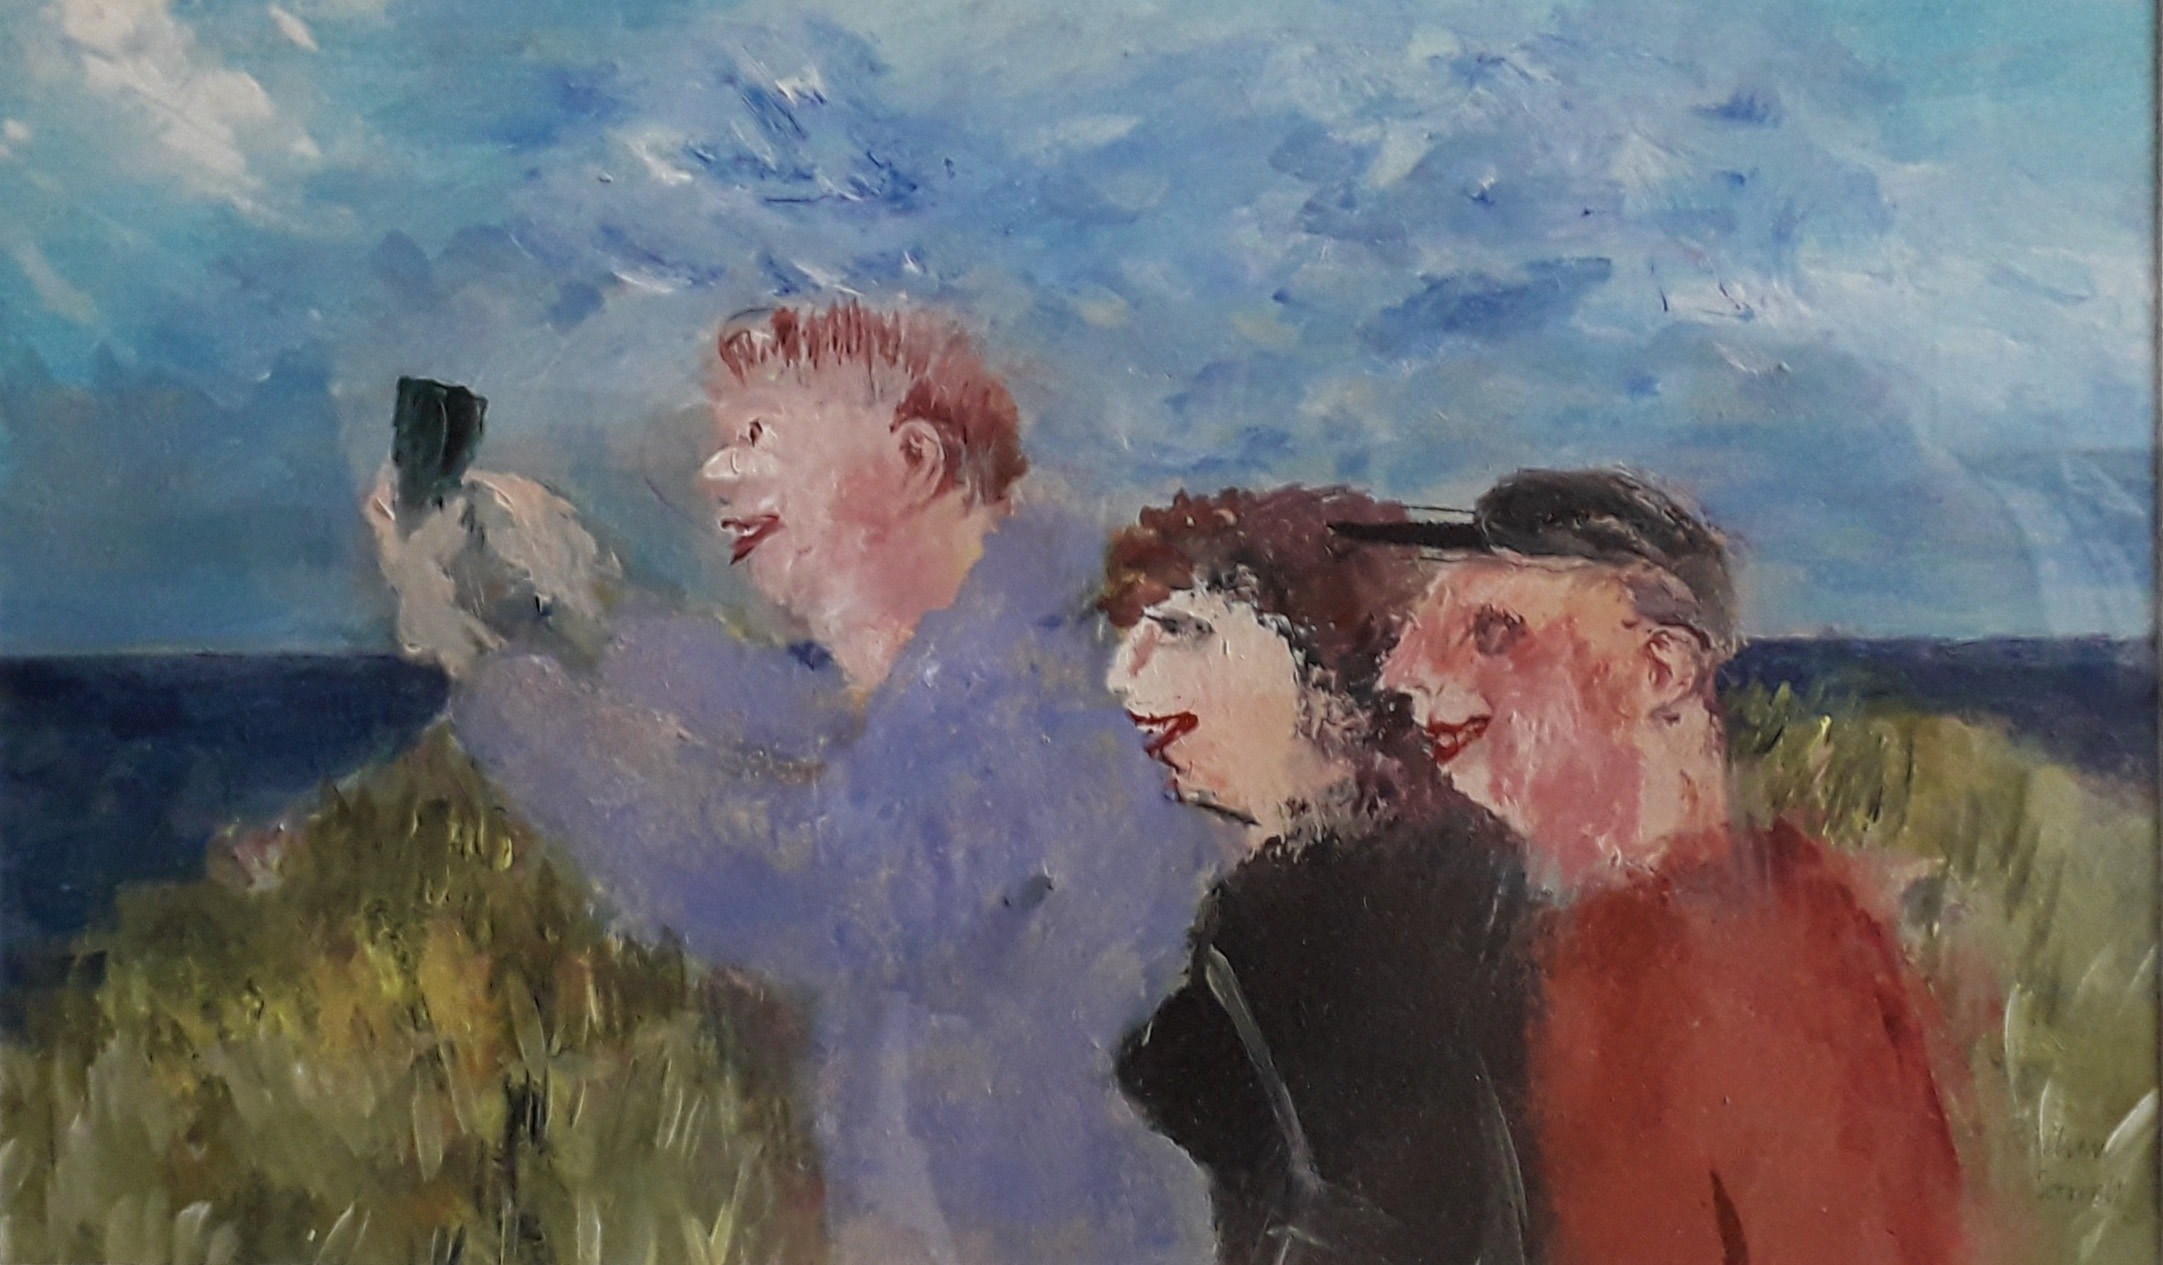 "<span class=""link fancybox-details-link""><a href=""/artists/103-richard-sorrell/works/12316-richard-sorrell-a-selfie-on-the-coastal-path/"">View Detail Page</a></span><div class=""artist""><span class=""artist""><strong>Richard Sorrell</strong></span></div><div class=""title""><em>A Selfie on the Coastal Path</em></div><div class=""medium"">acrylic</div><div class=""dimensions"">Frame: 47 x 60 cm<br /> Artwork: 27 x 44 cm</div><div class=""price"">£750.00</div>"